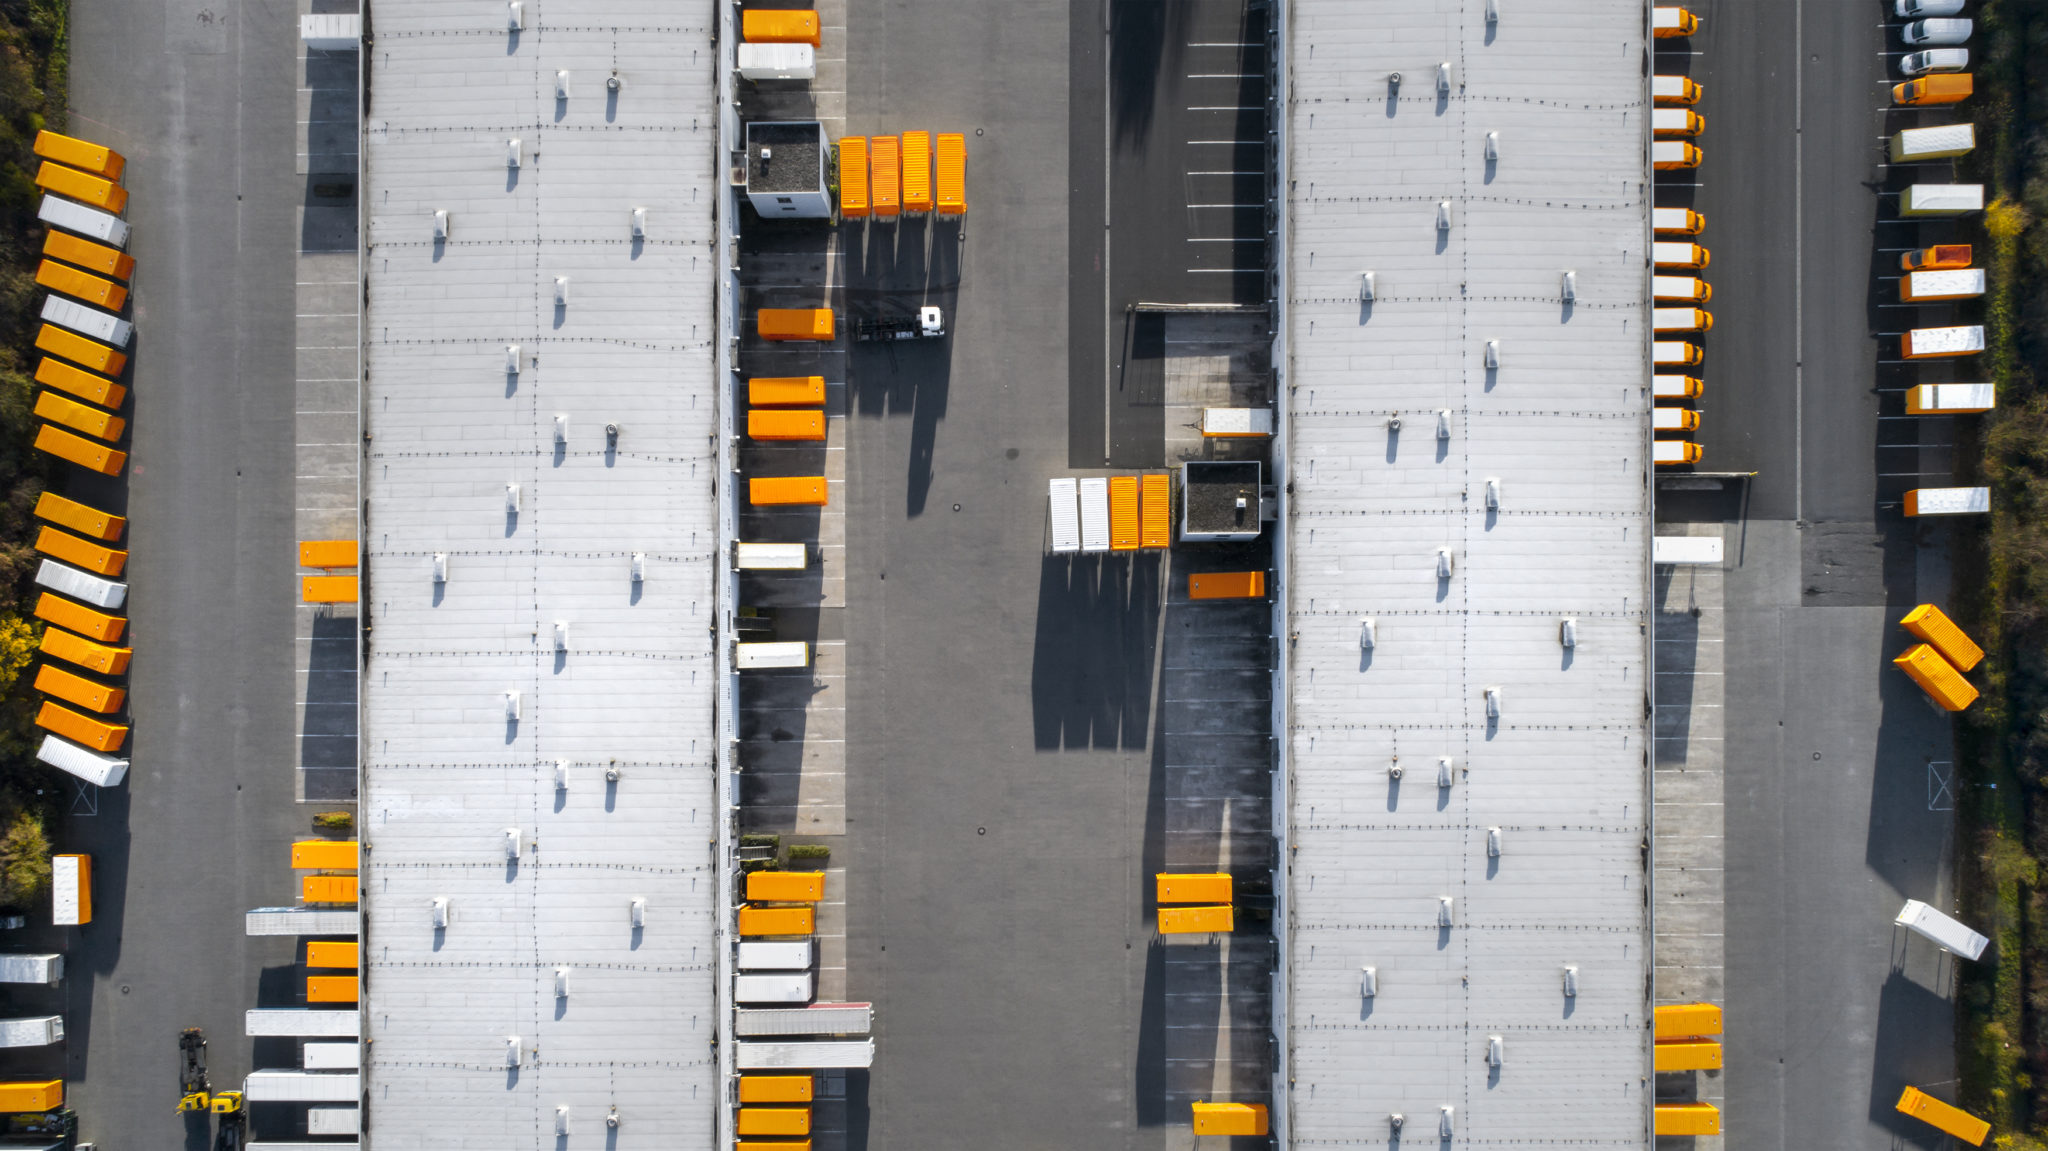 RC_abstract_logistics_distribution